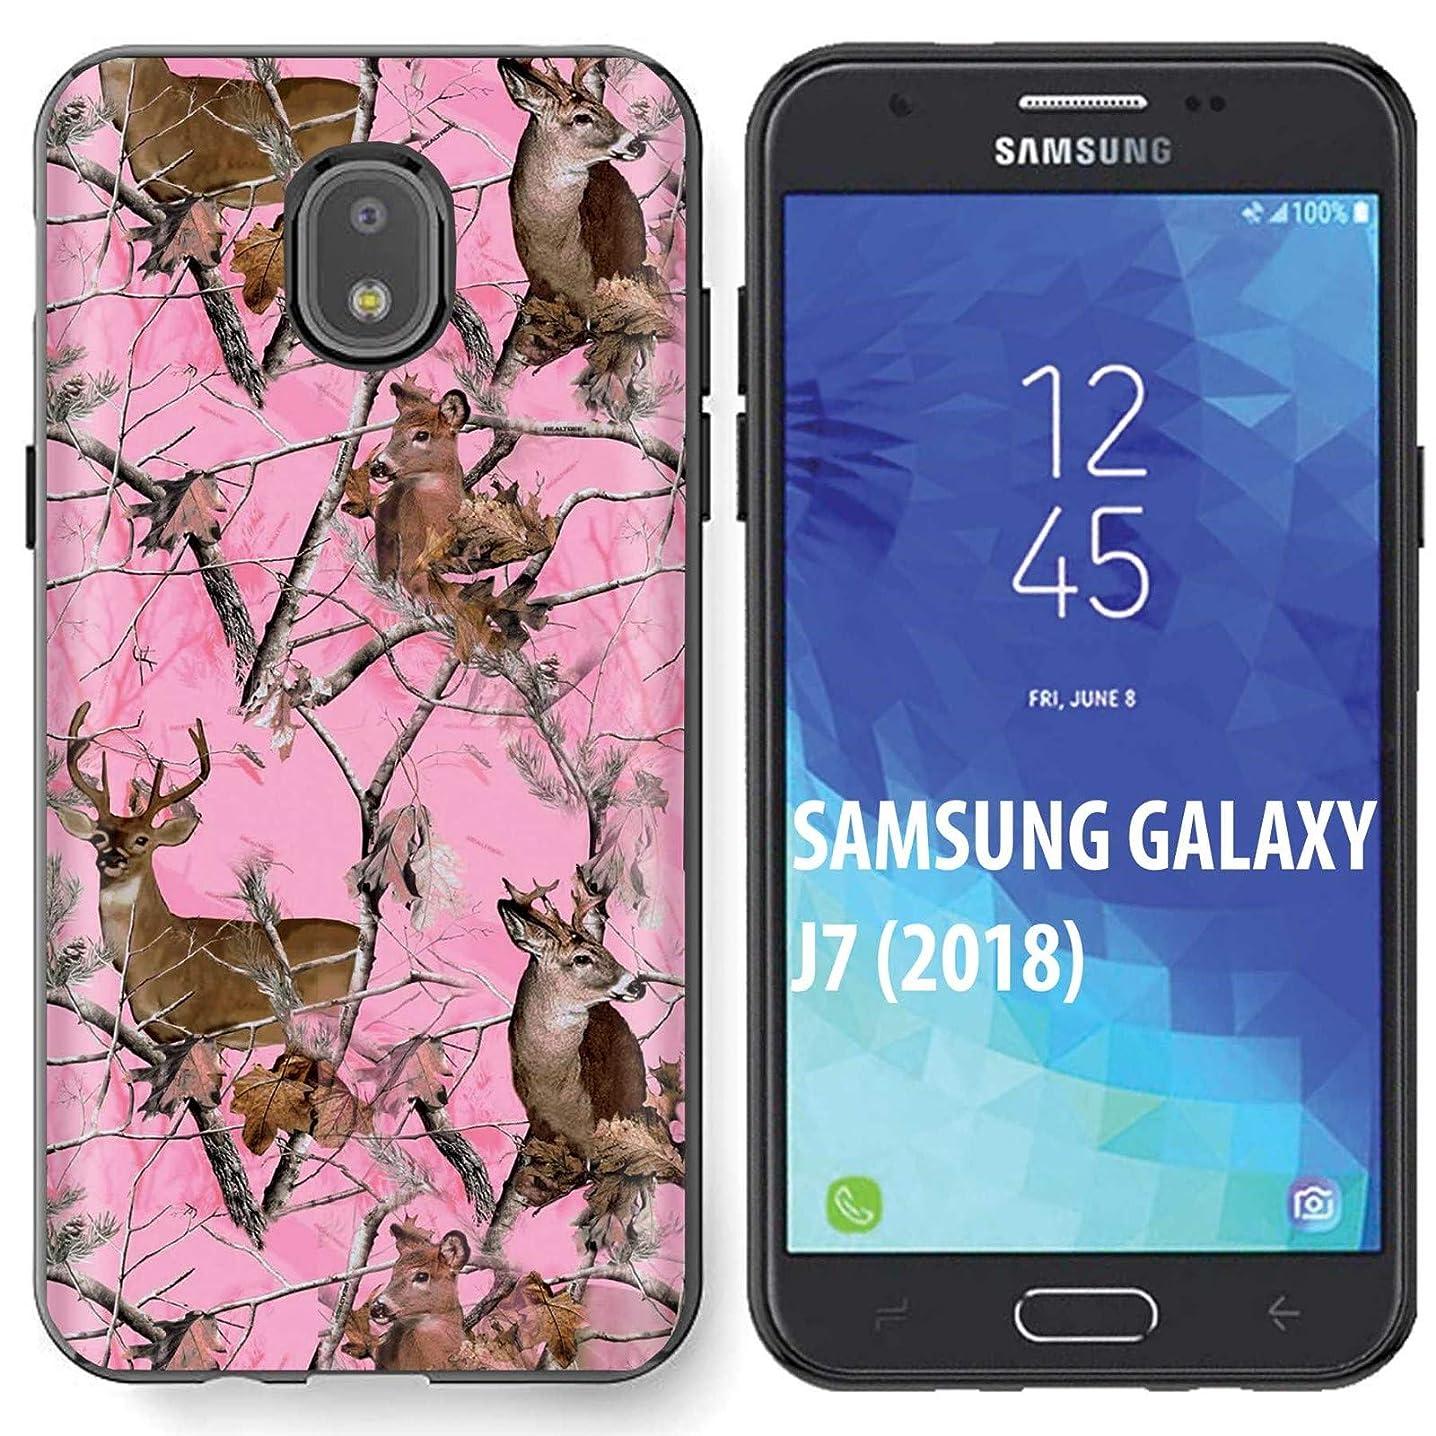 [NakedShield] Samsung Galaxy (J7 2018)/J7 Aero/J7 Refine/J7 Star/J737/J7 V 2nd Gen [Black] Ultra Slim TPU Phone Cover Case [Pink Deer Camouflage Print]